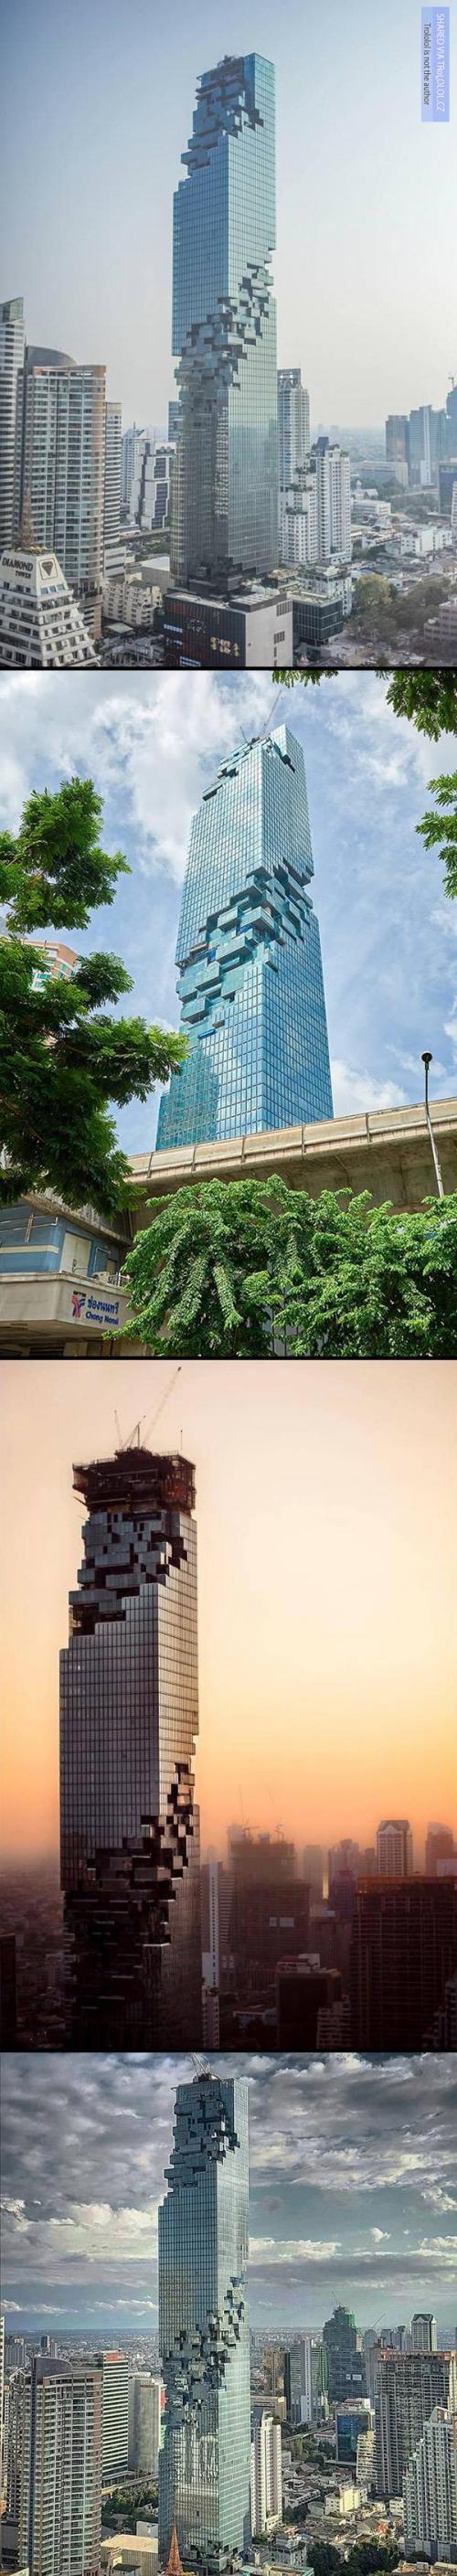 Mrakodrap v Bangkoku